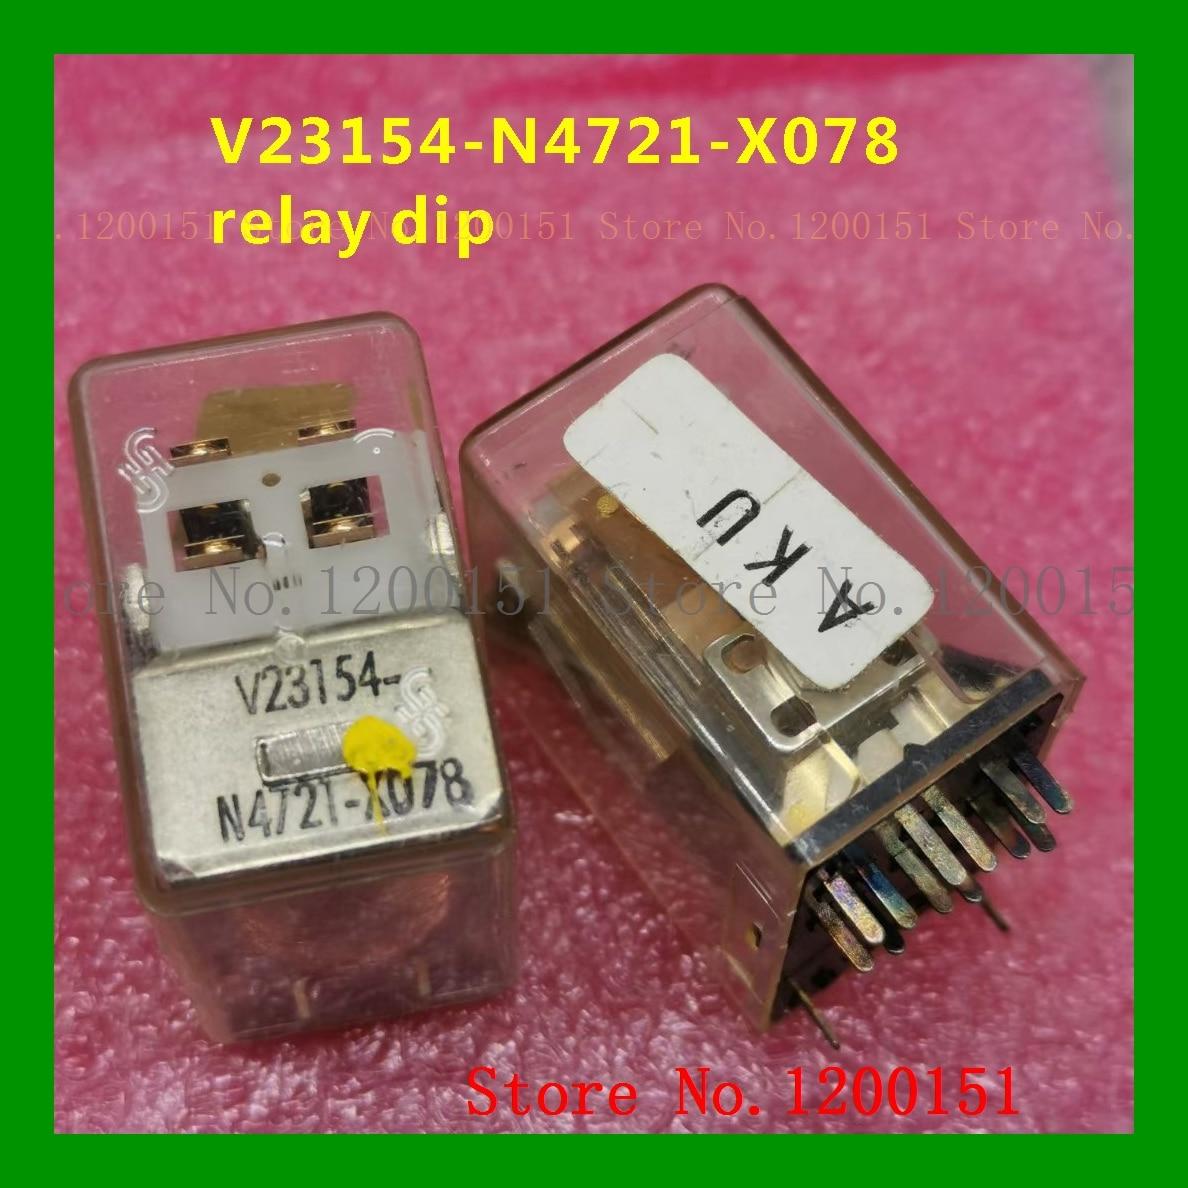 V23154-N4721-X078 تتابع dip